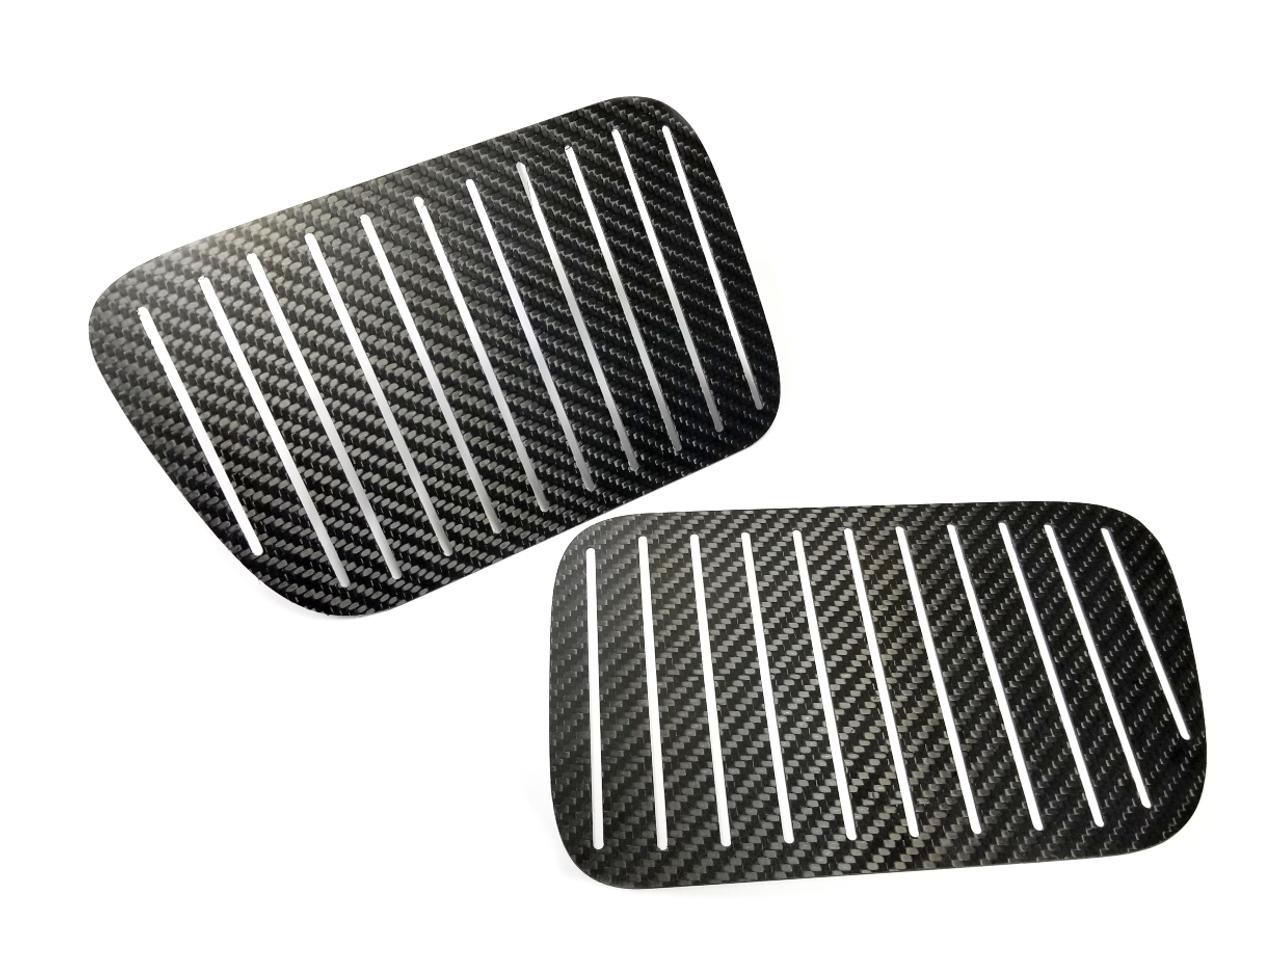 "HARD Motorsport - BMW E36 Carbon Fiber Kidney Grill Aero ""Qualifying Plates"" - BMW E36"